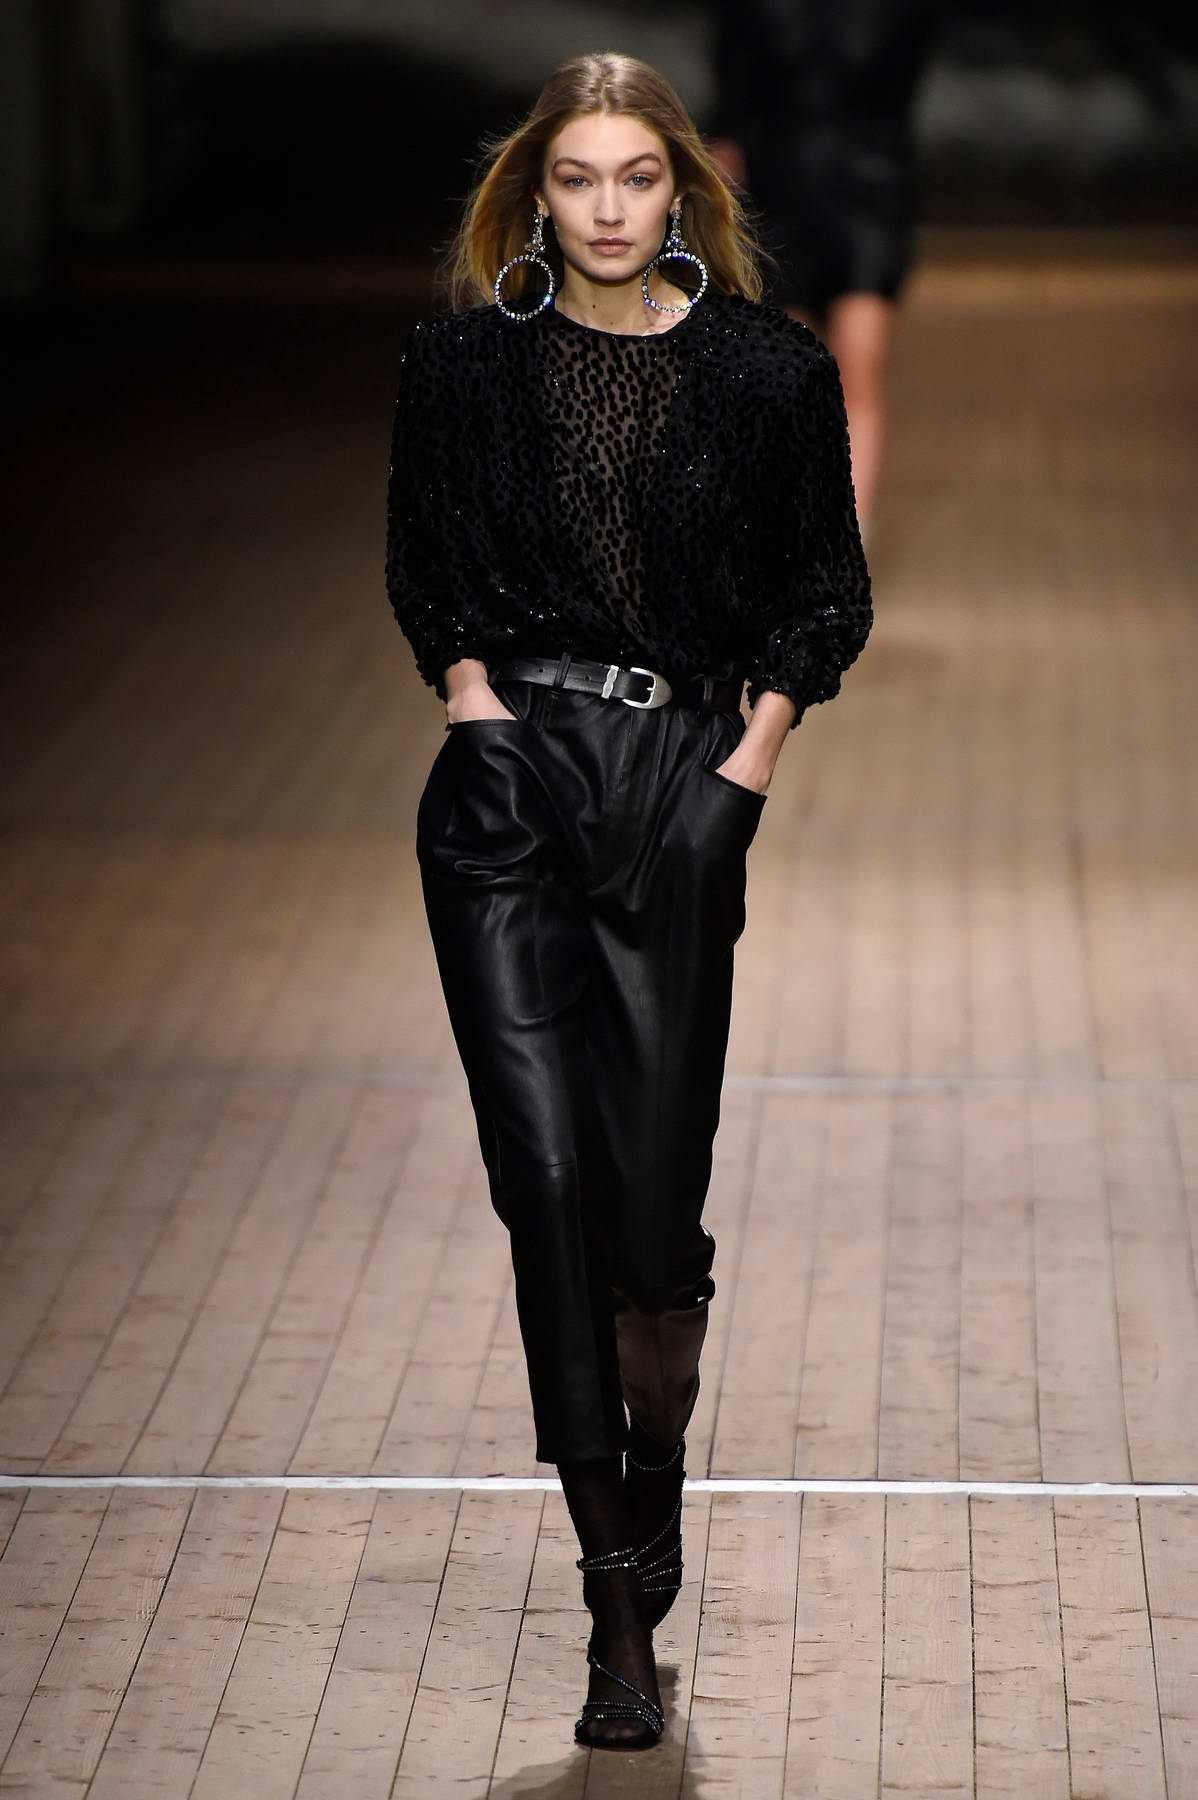 Gigi Hadid walks for Isabel Marant Show during Paris Fashion Week, France